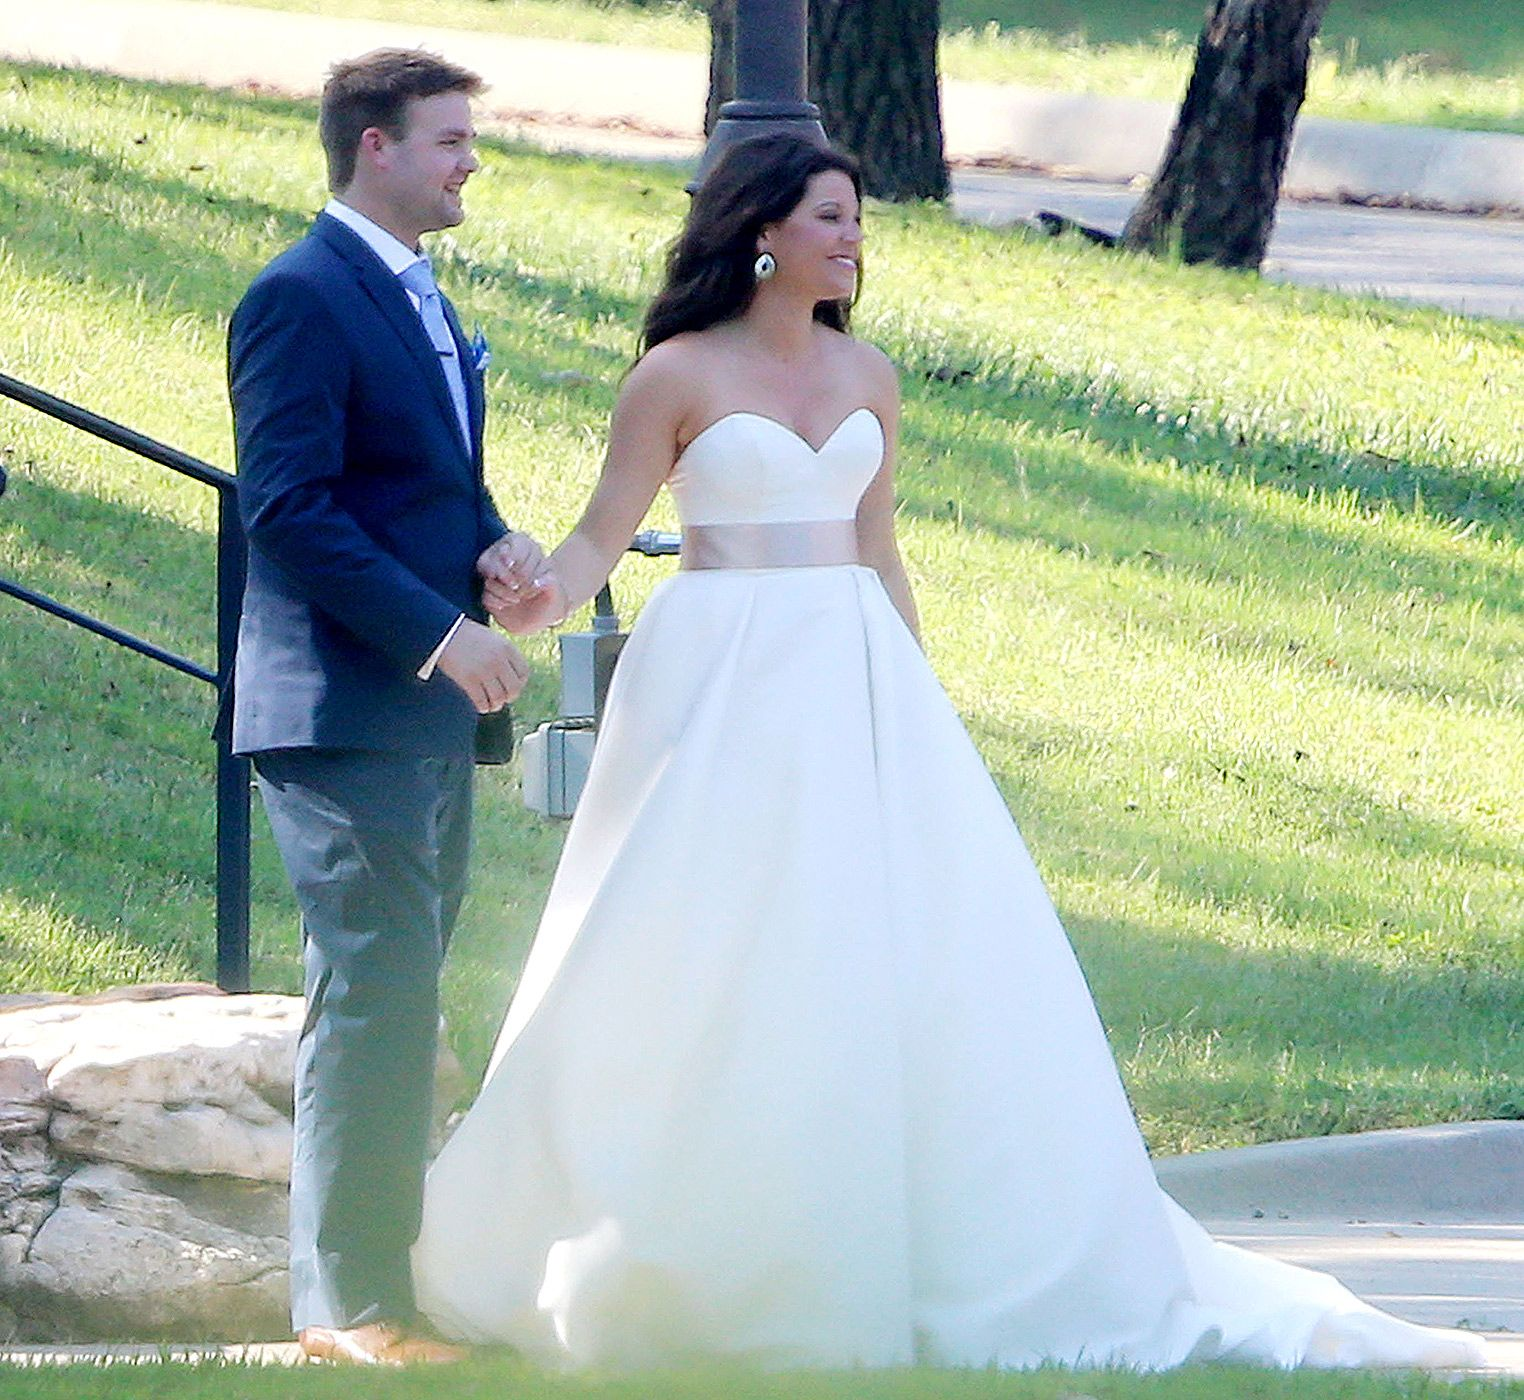 Blushing Bride See Amy Duggar S Rule Breaking Wedding Dress Amy Duggar Celebrity Bride Duggar Wedding